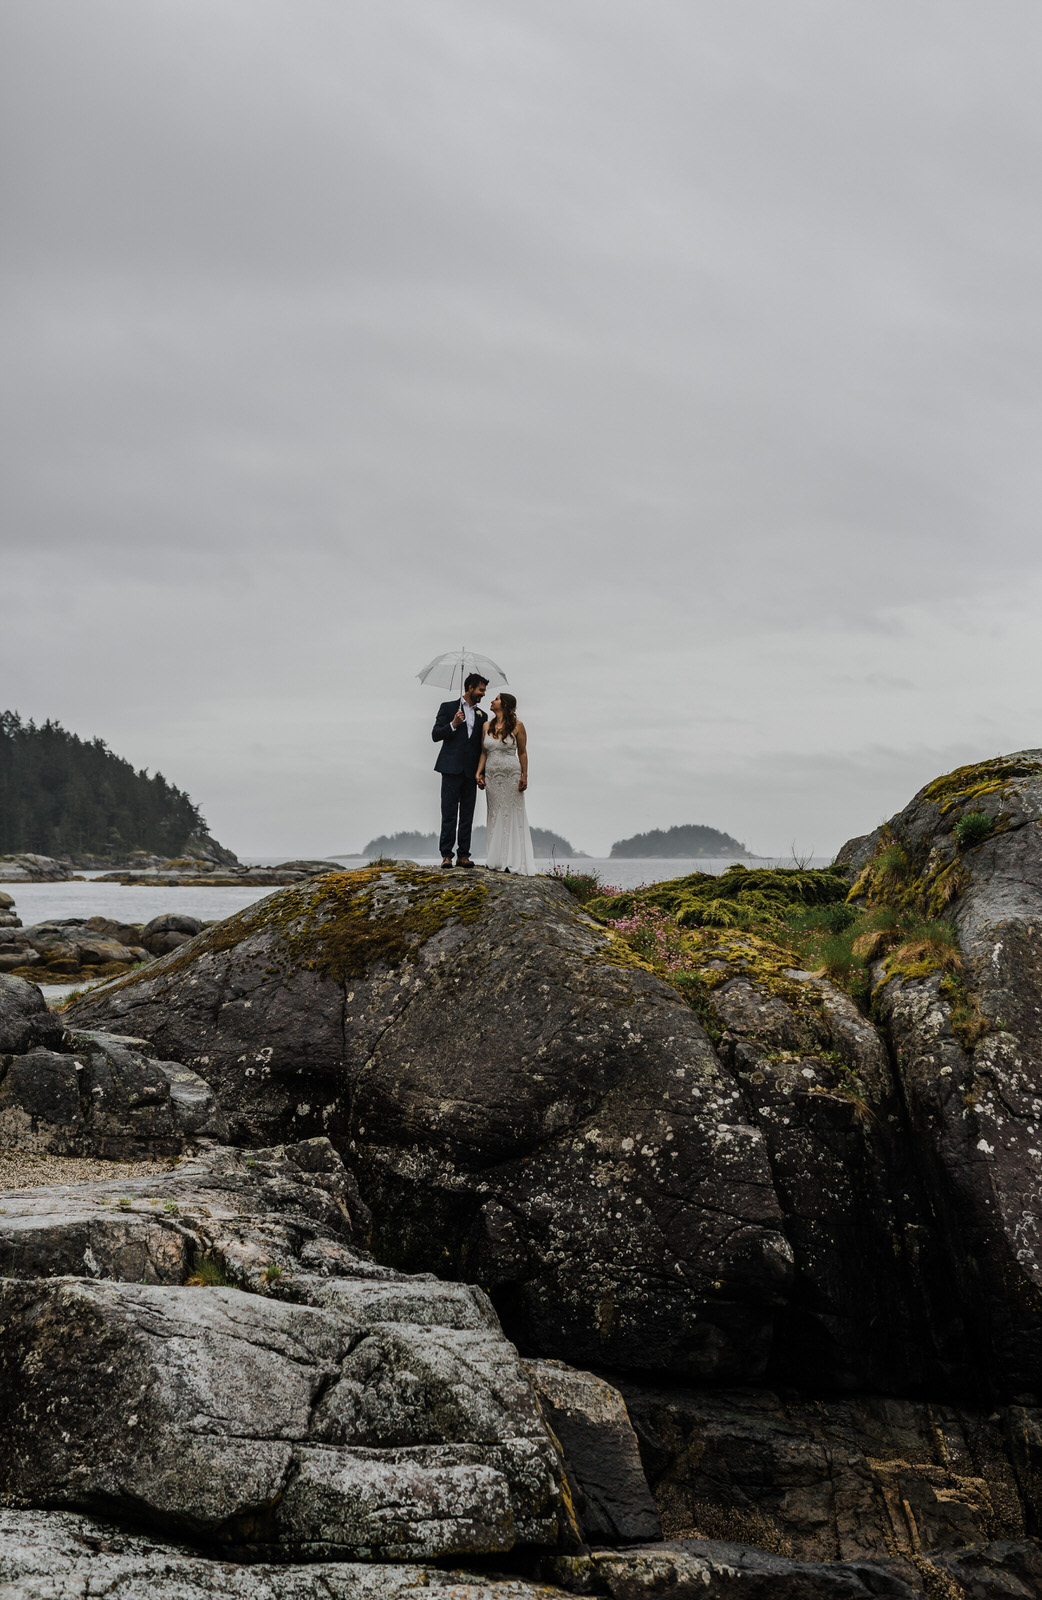 Sunshine Coast BC Elopement - Jennifer Picard Photography - IMG_6408.jpg